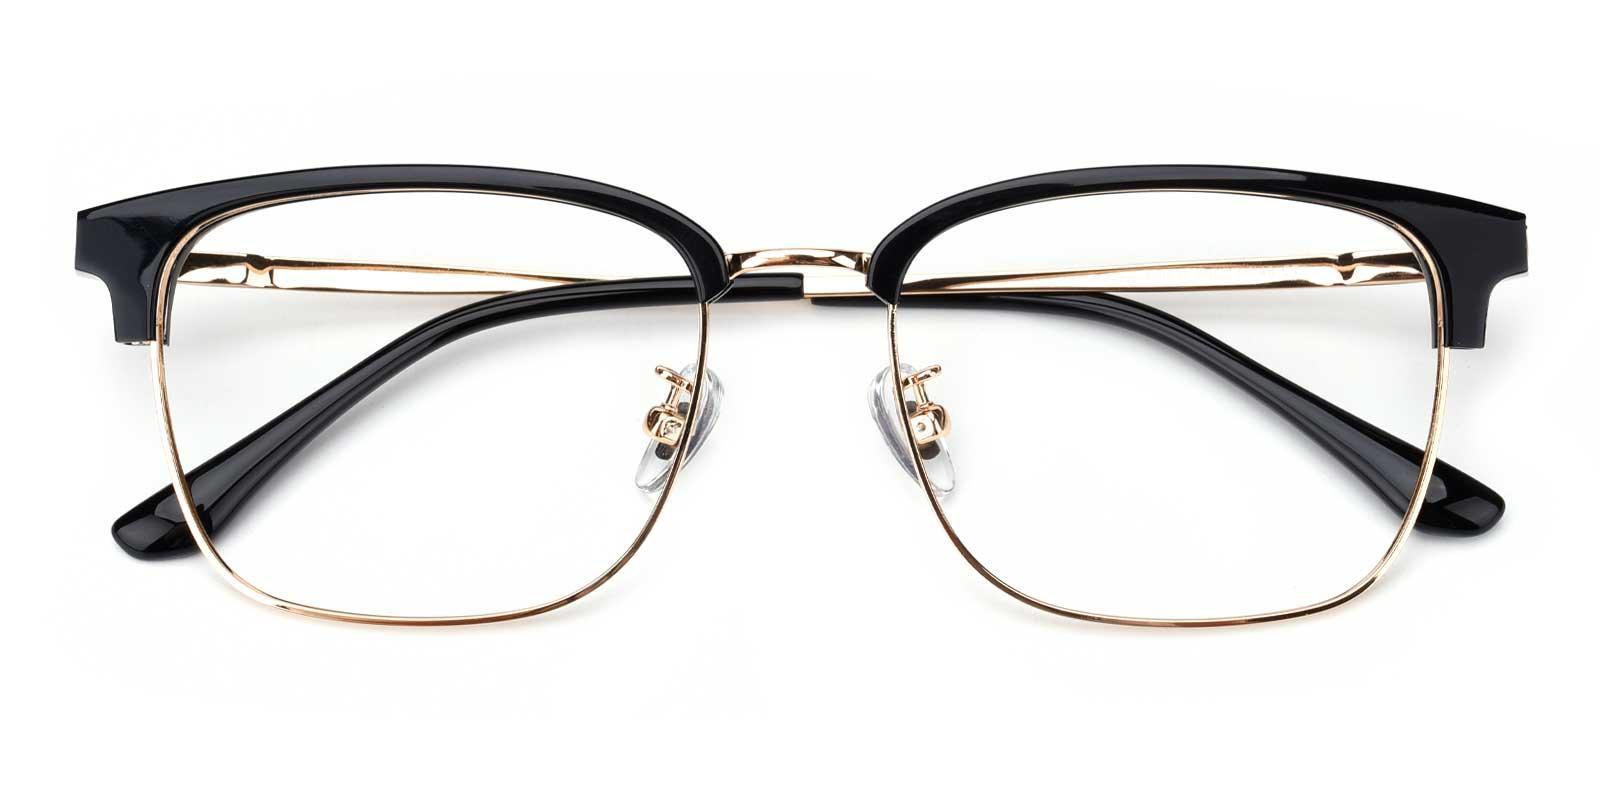 Yuri-Gold-Browline-Titanium-Eyeglasses-detail